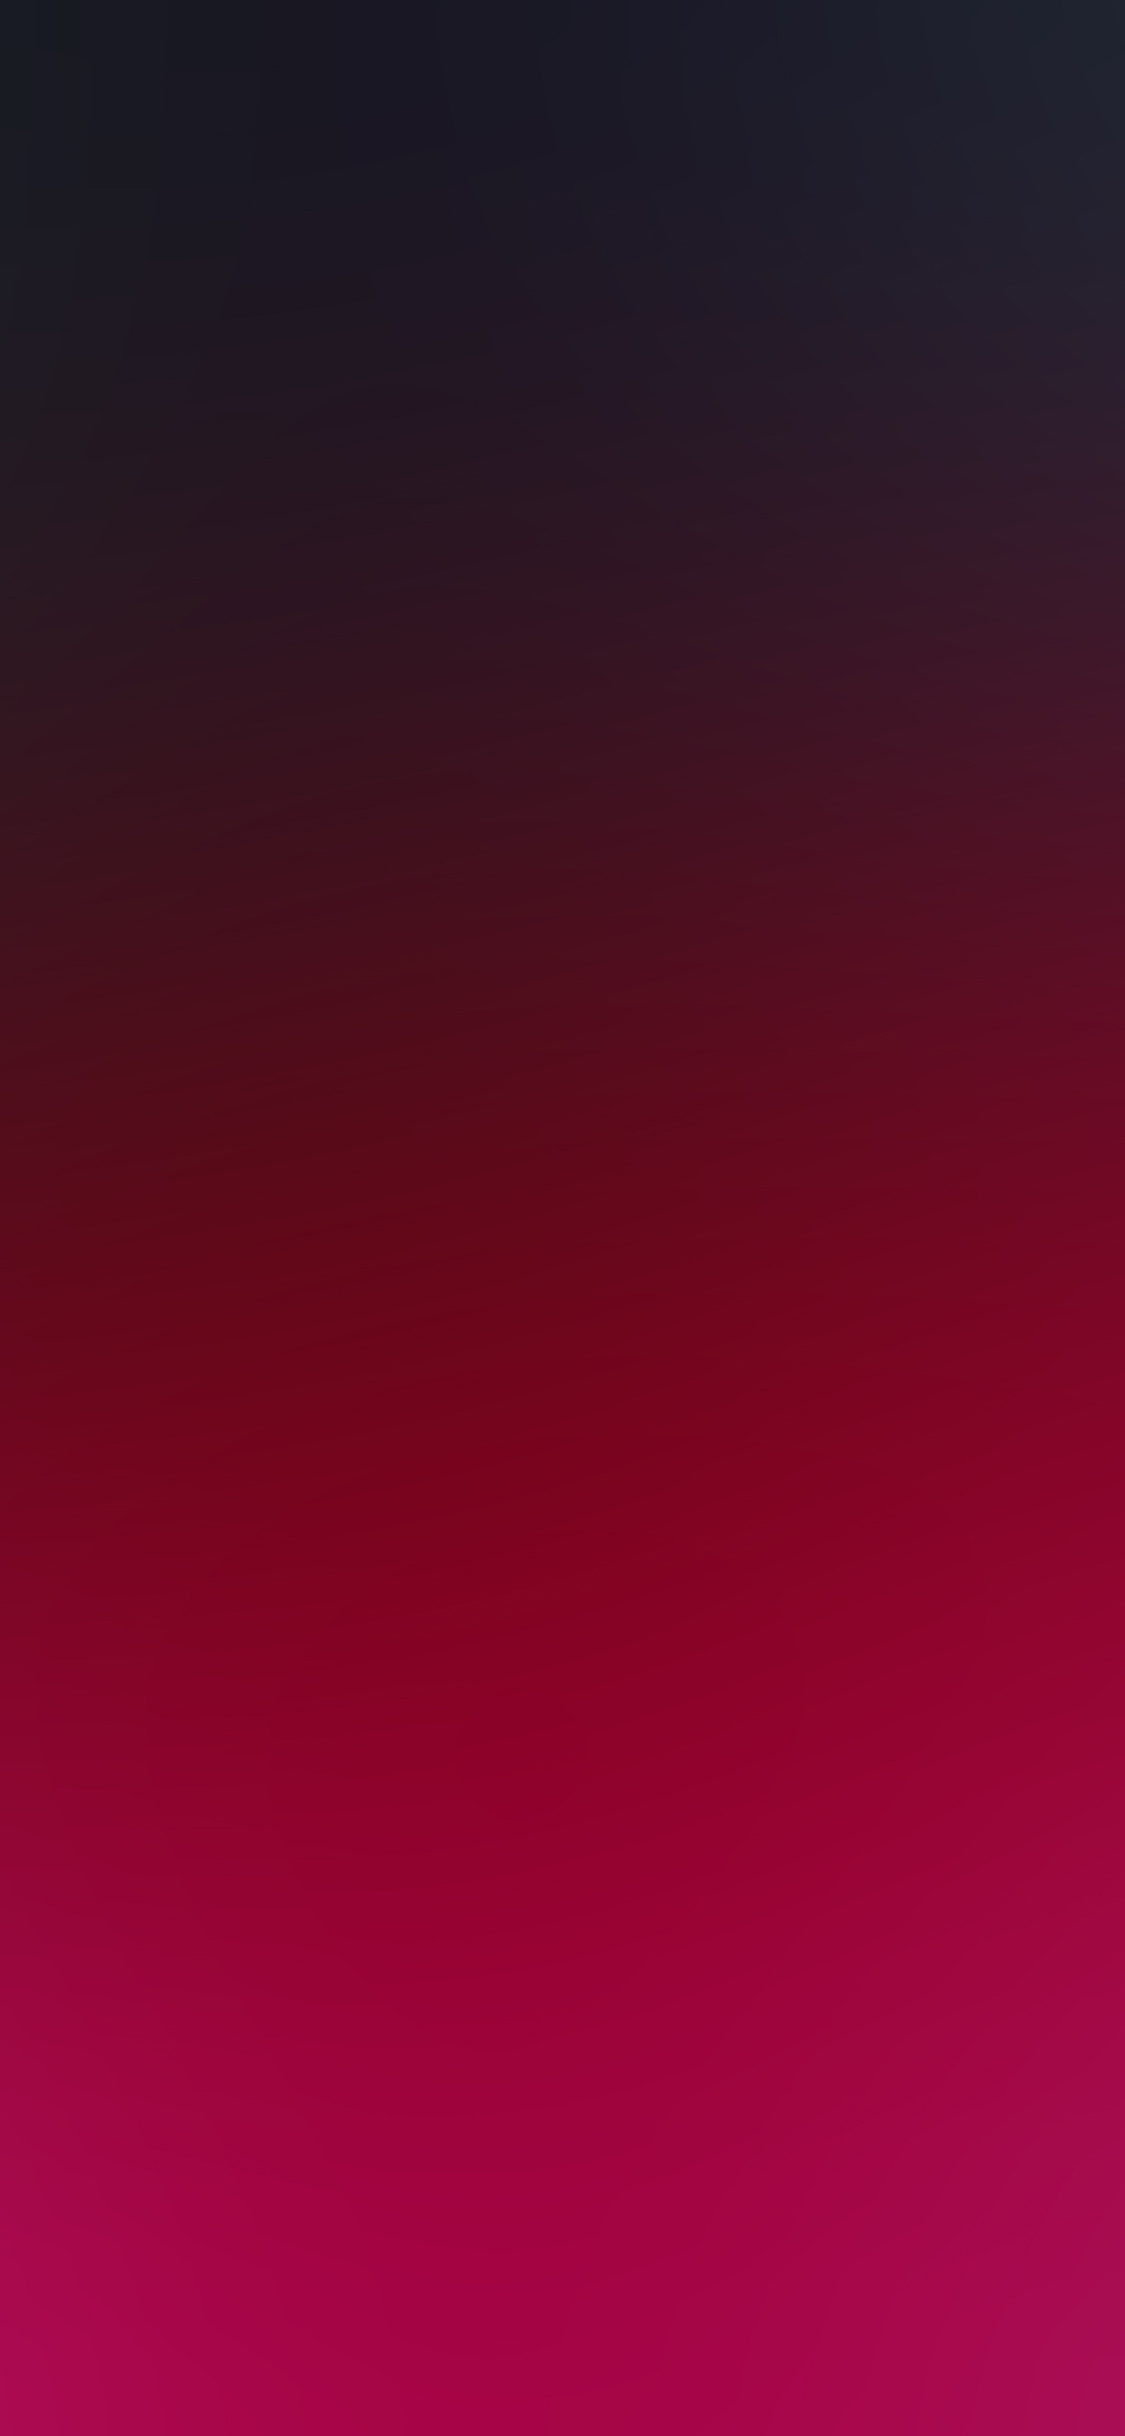 Red Iphone Wallpaper - Dark Red Wallpaper Iphone X , HD Wallpaper & Backgrounds